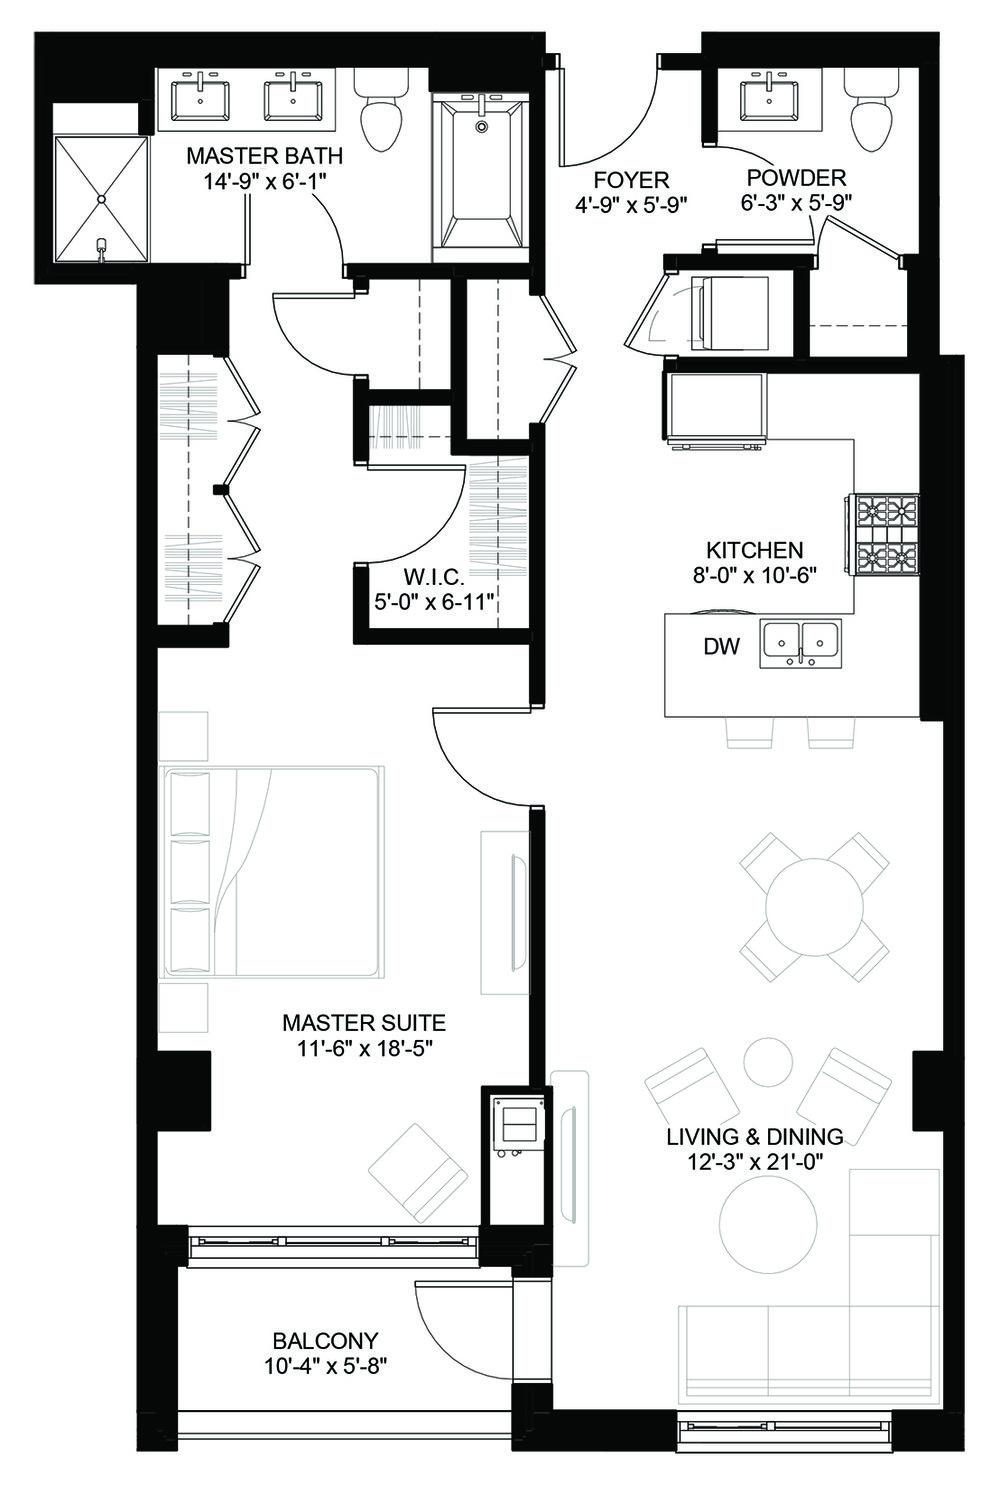 208_308_408_Floorplan.jpg